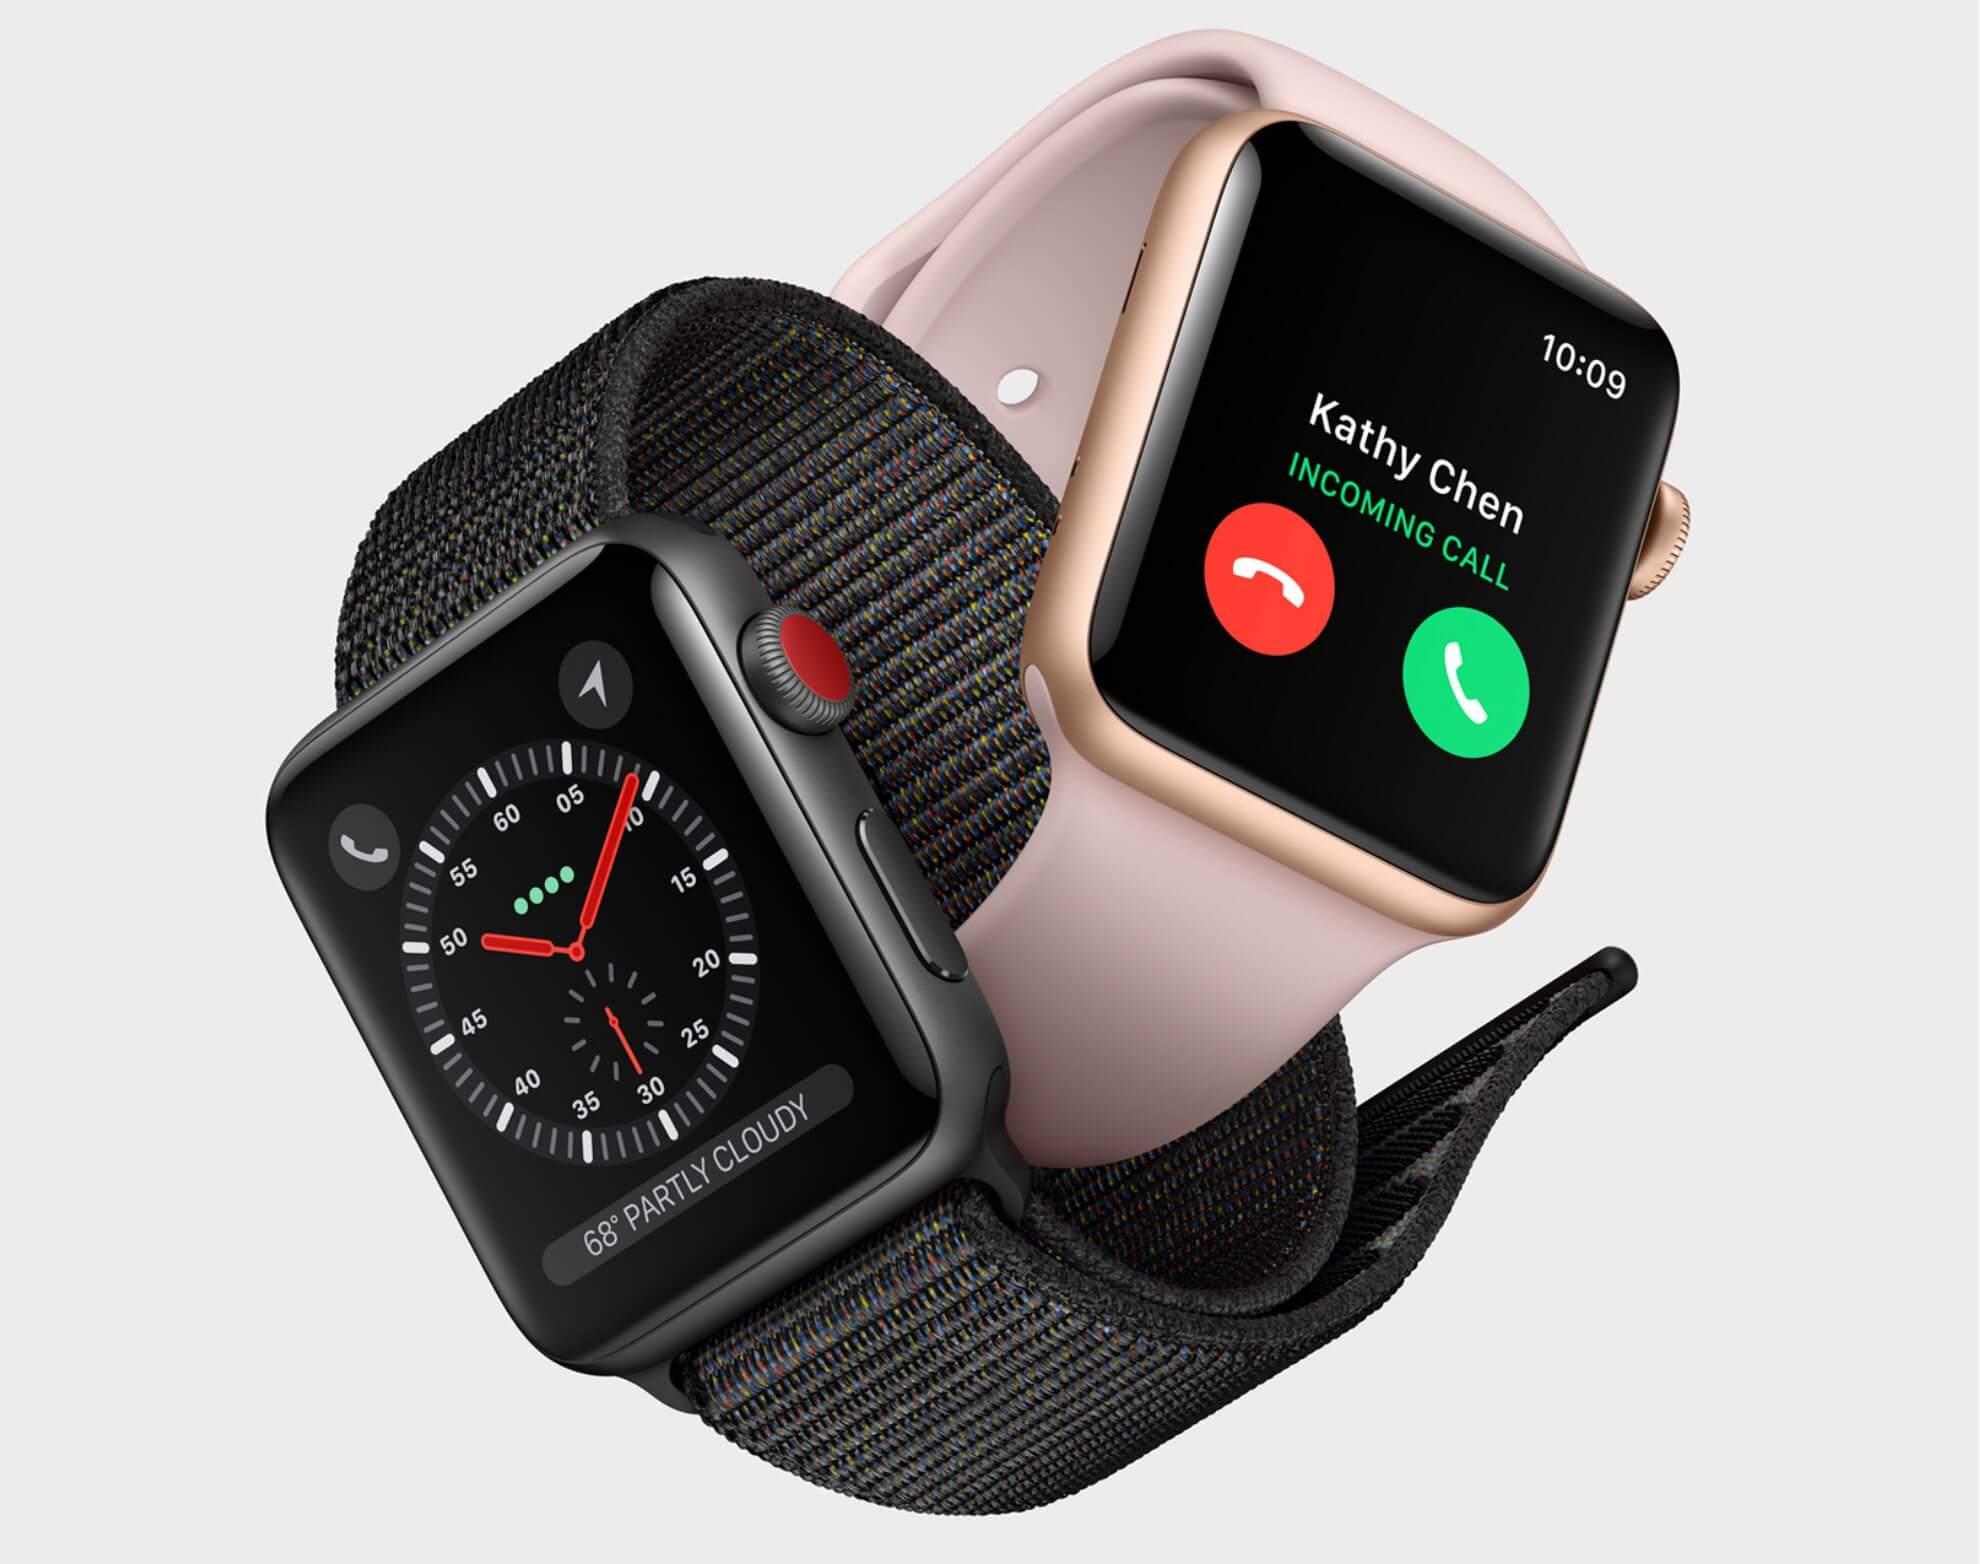 48ddddf894fa8 Tags4G Apple Apple Watch Apple Watch series 3 autonomia bateria Bluetooth  chip W2 comprar Design dica gps iPhone iPhone X Lançamento no Brasil modelo  ...